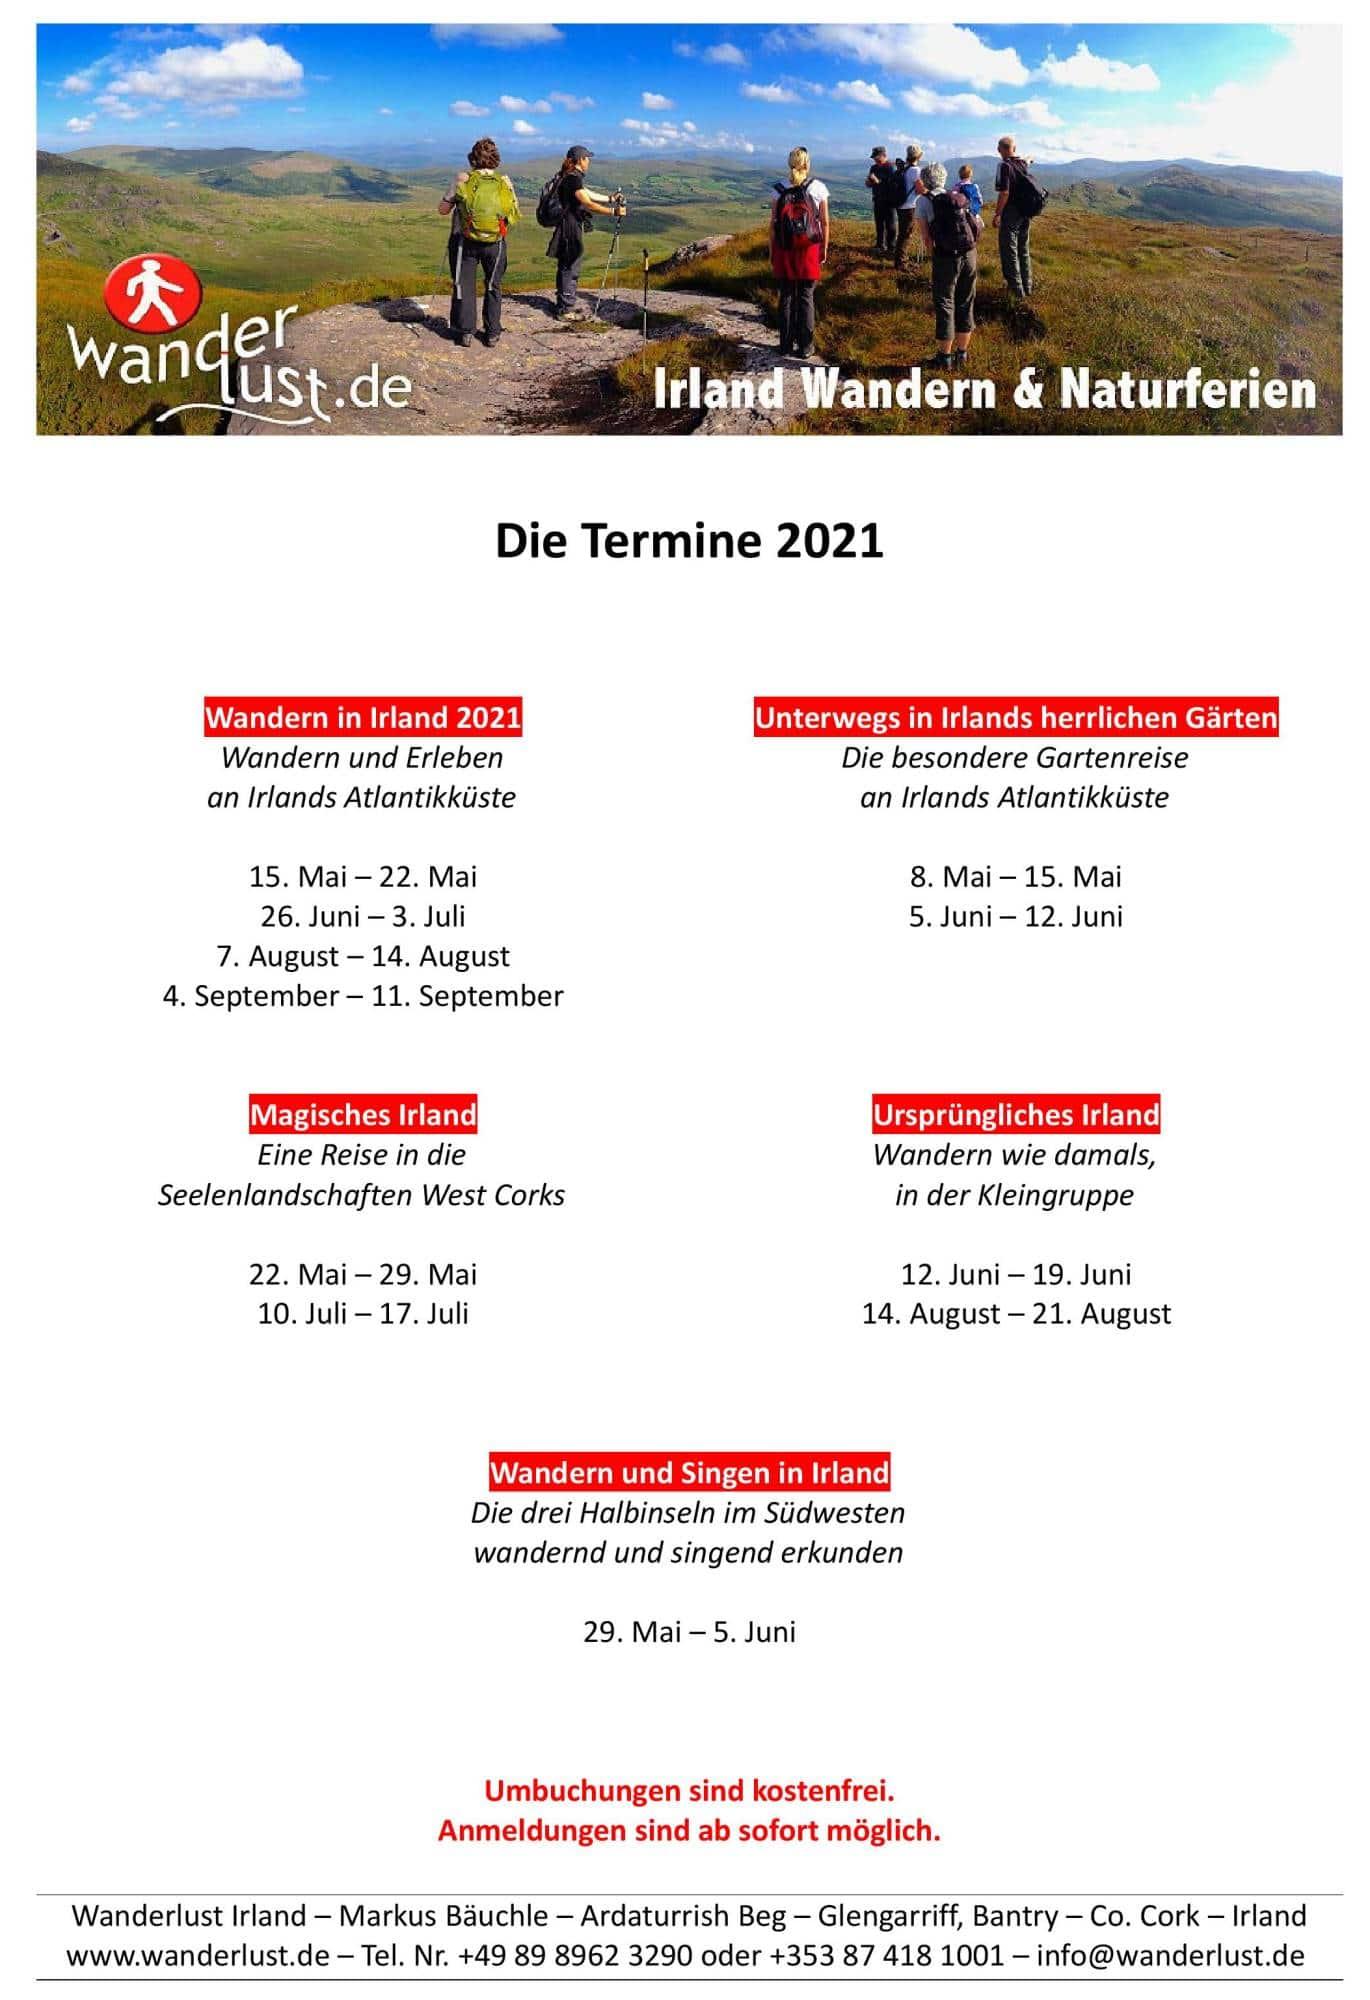 Wanderlust Irland Termine 2021